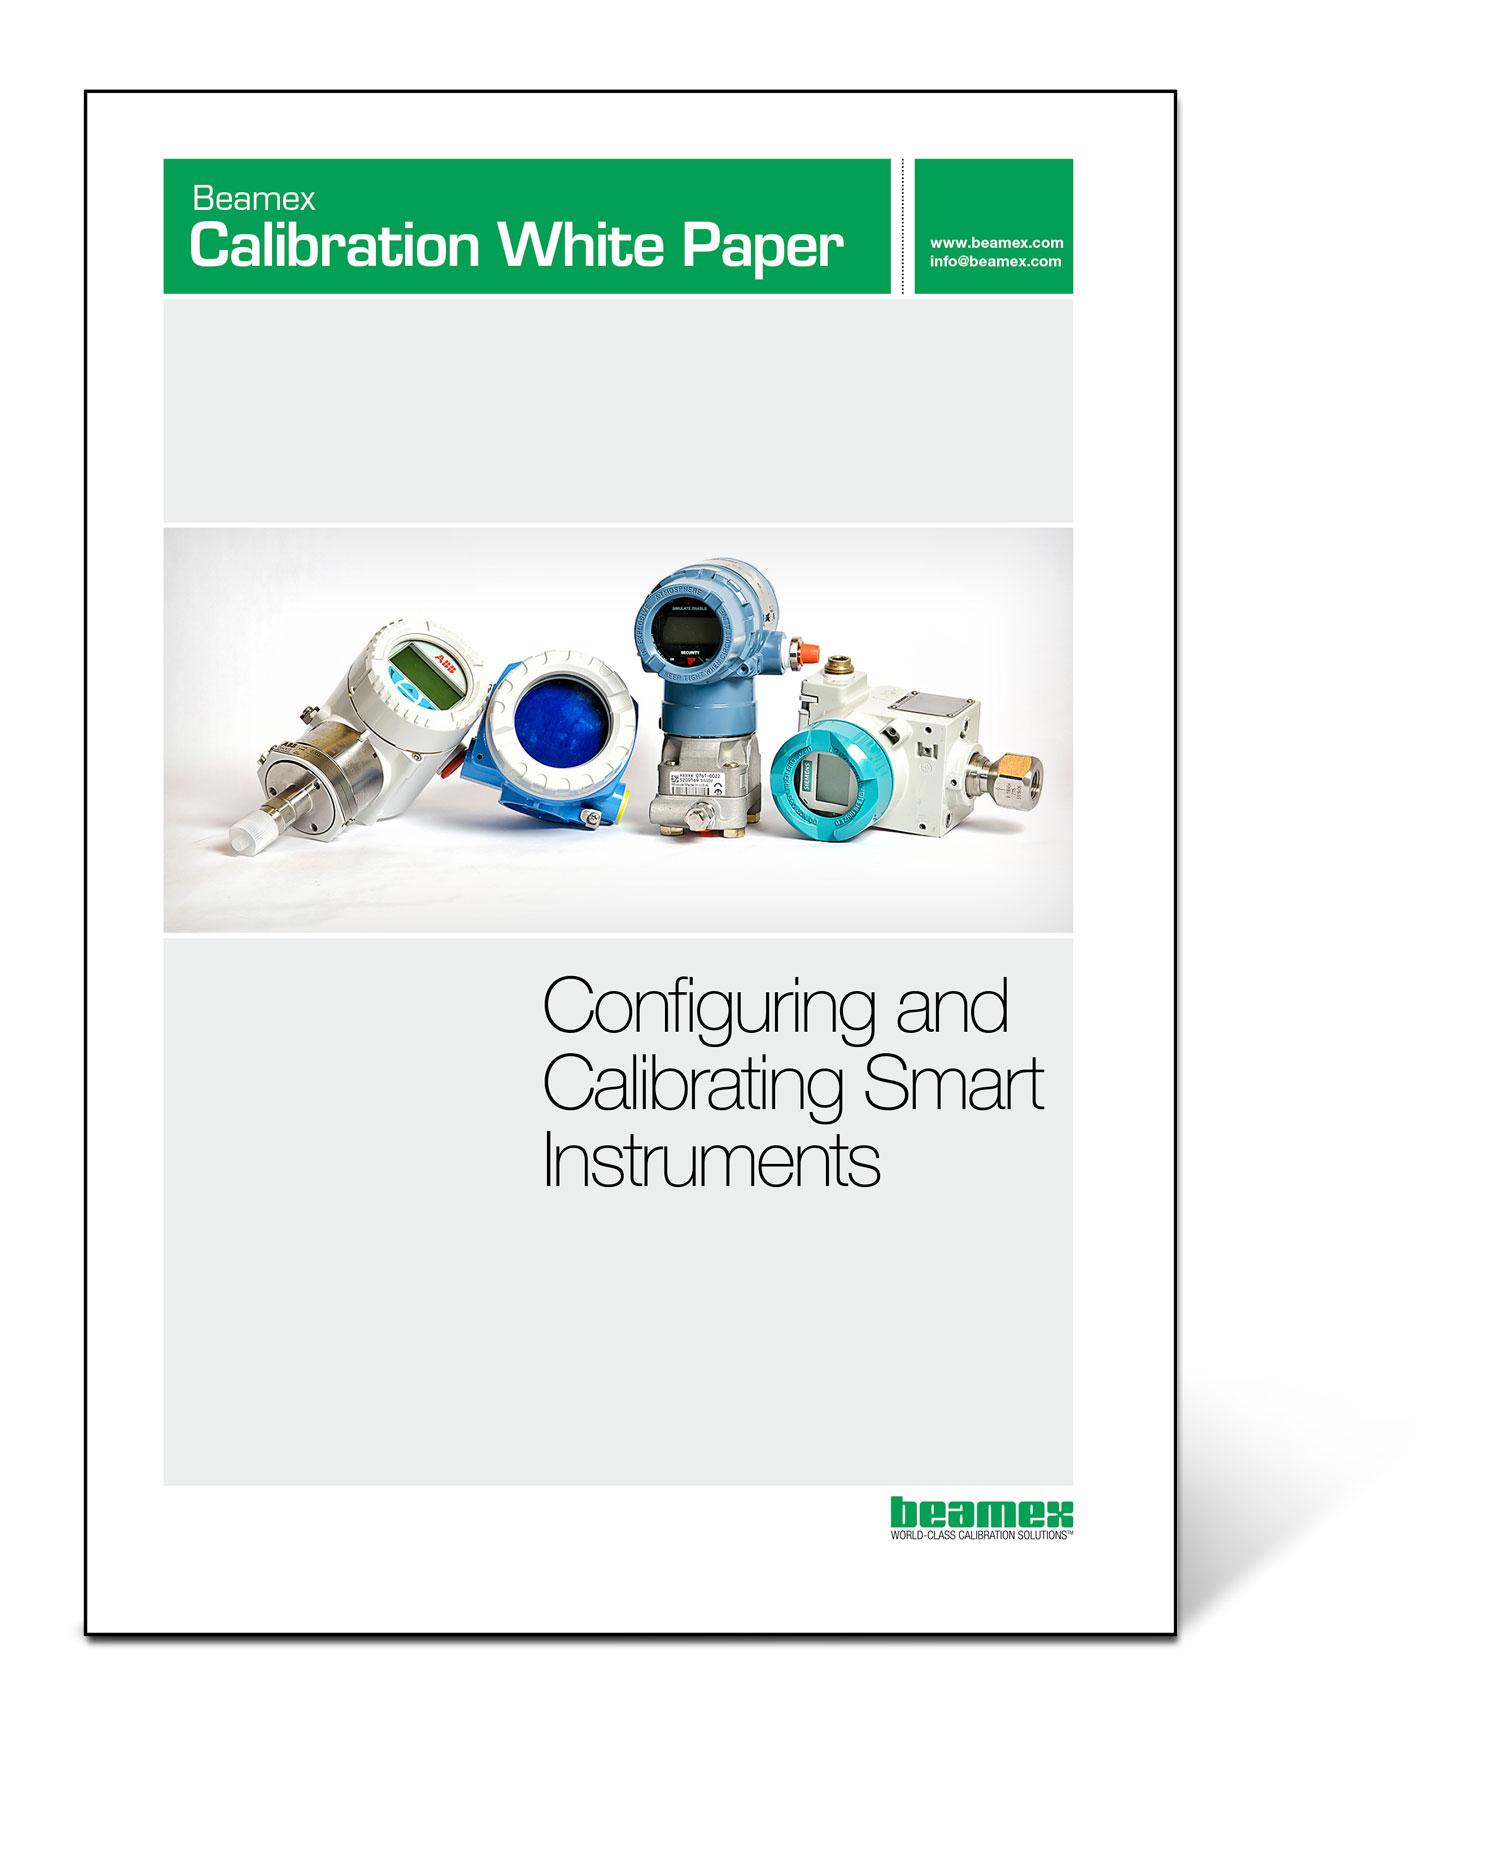 Beamex Calibration White Paper - Calibrating smart instruments